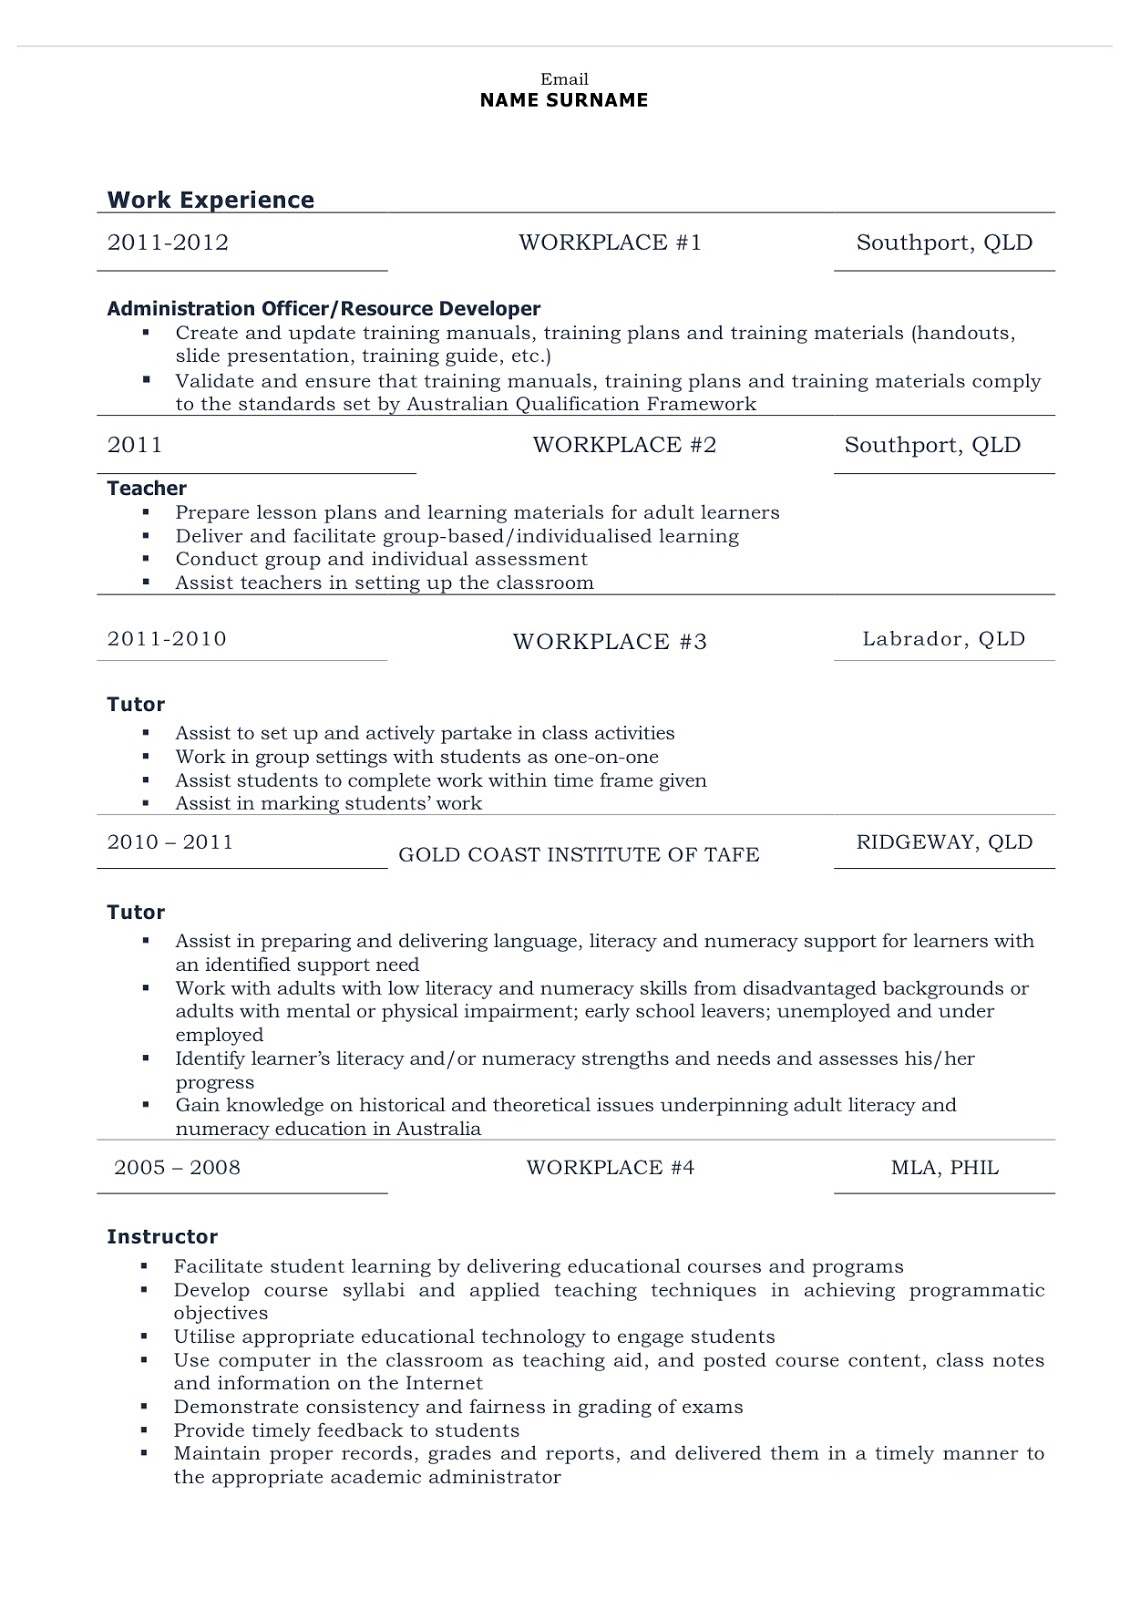 Job Seek 101 How To Write A Resume Combination Resume